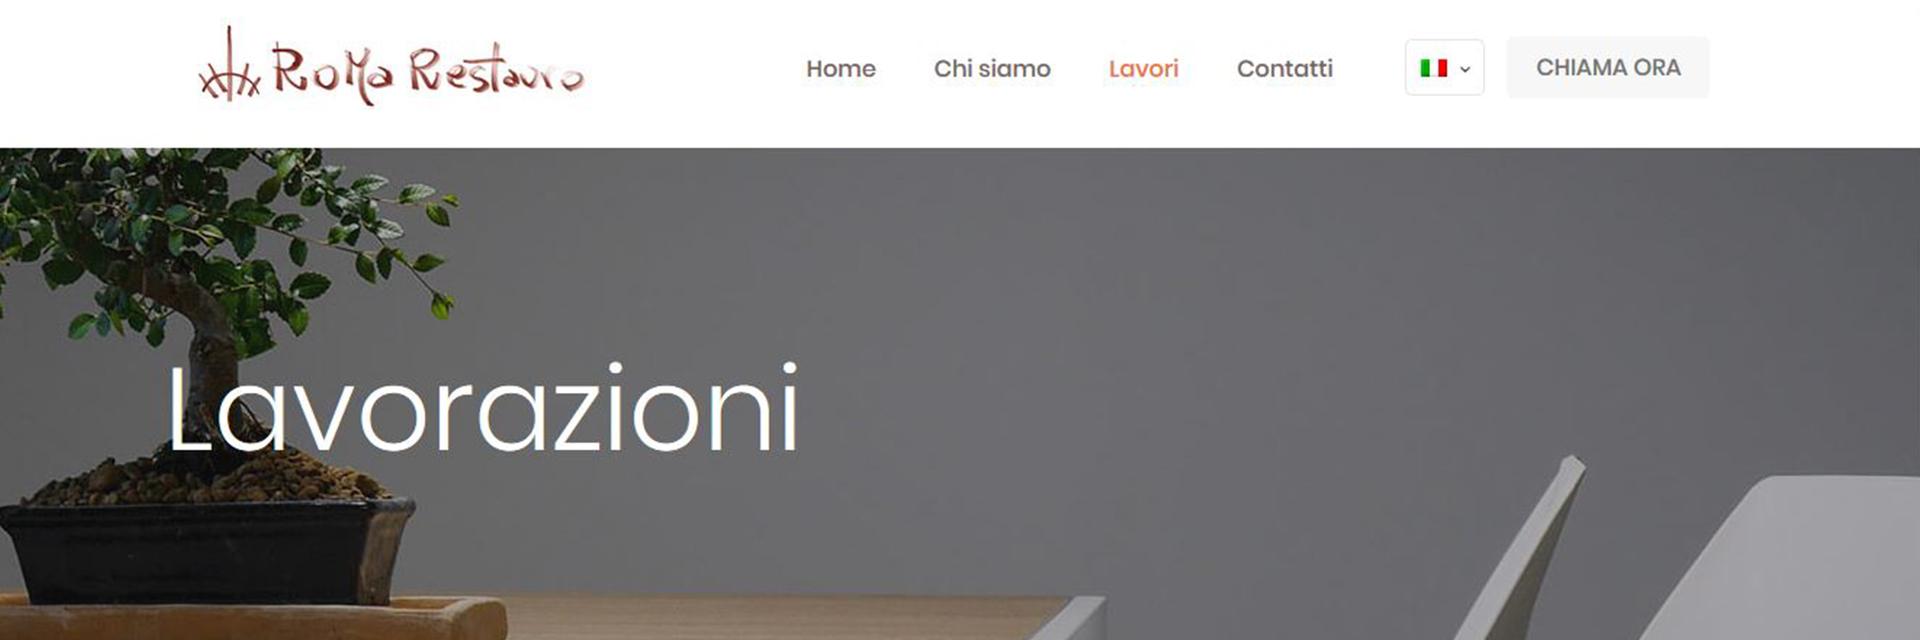 screen-roma-restauro-2